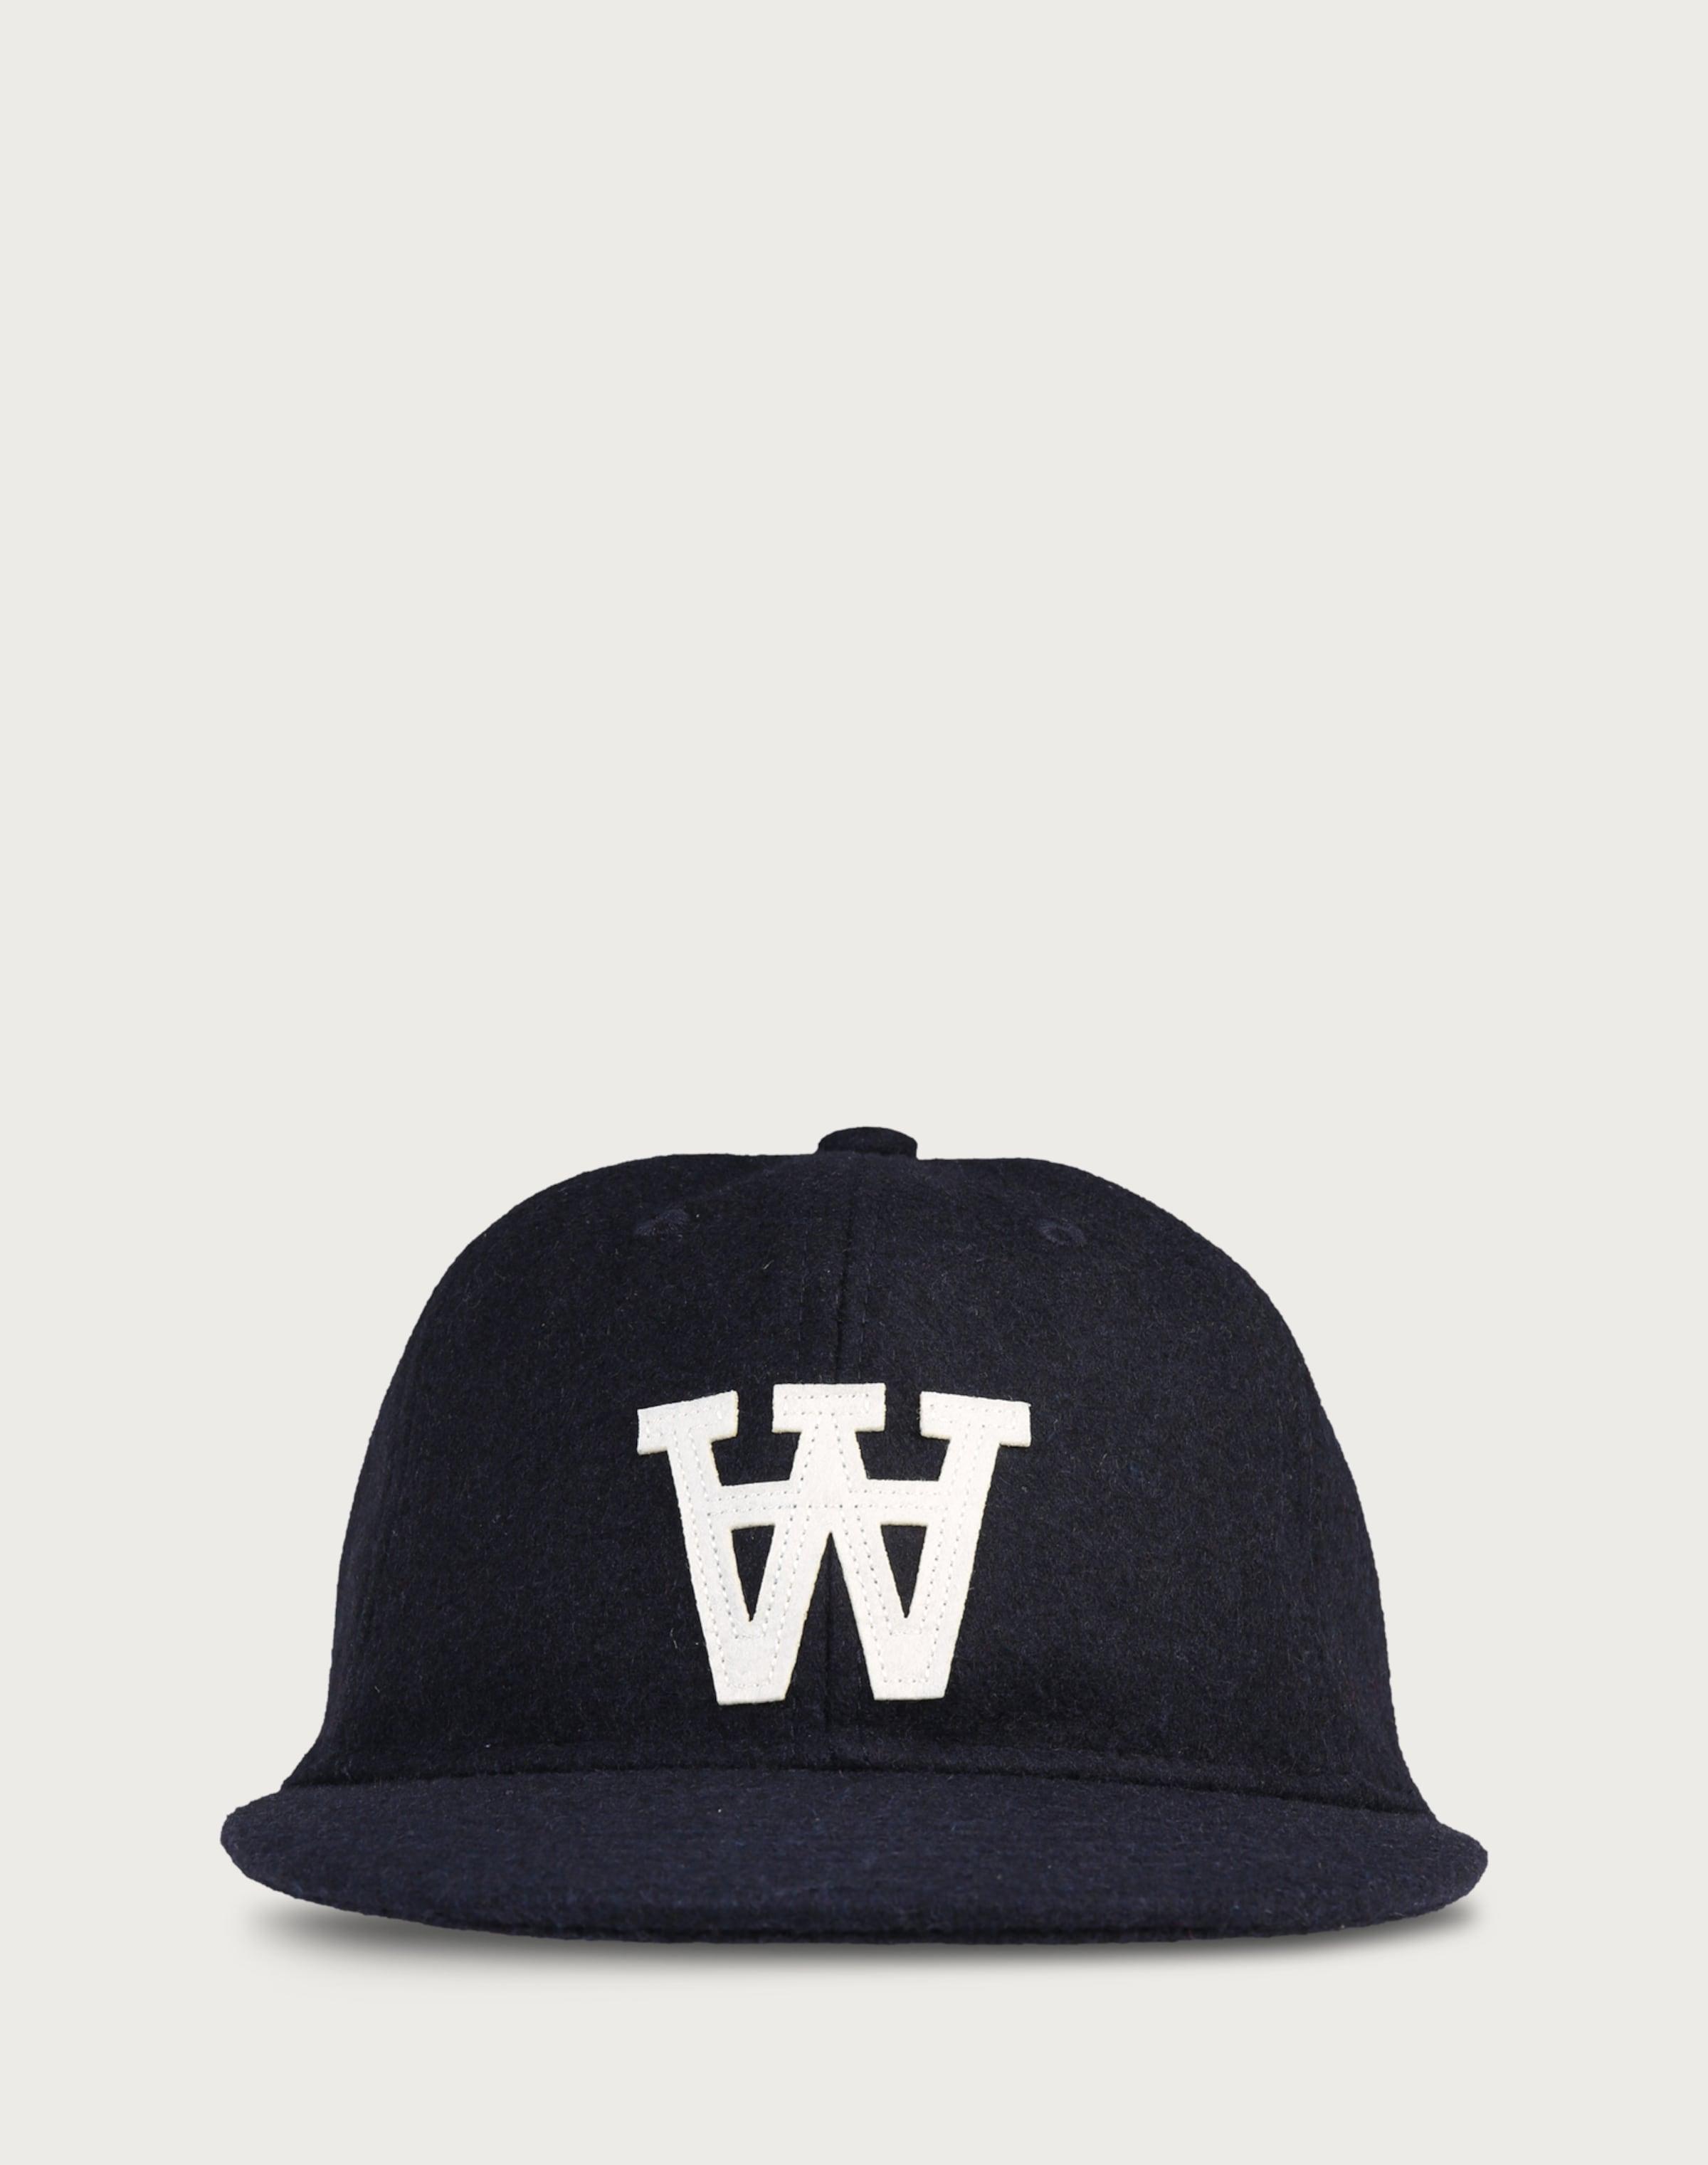 Rabatt Beste WOOD WOOD Weiche 'Baseball cap' Viele Arten Von Günstigem Preis Rabatt Bestellen Spielraum Niedriger Versand e2QpvIjRIA